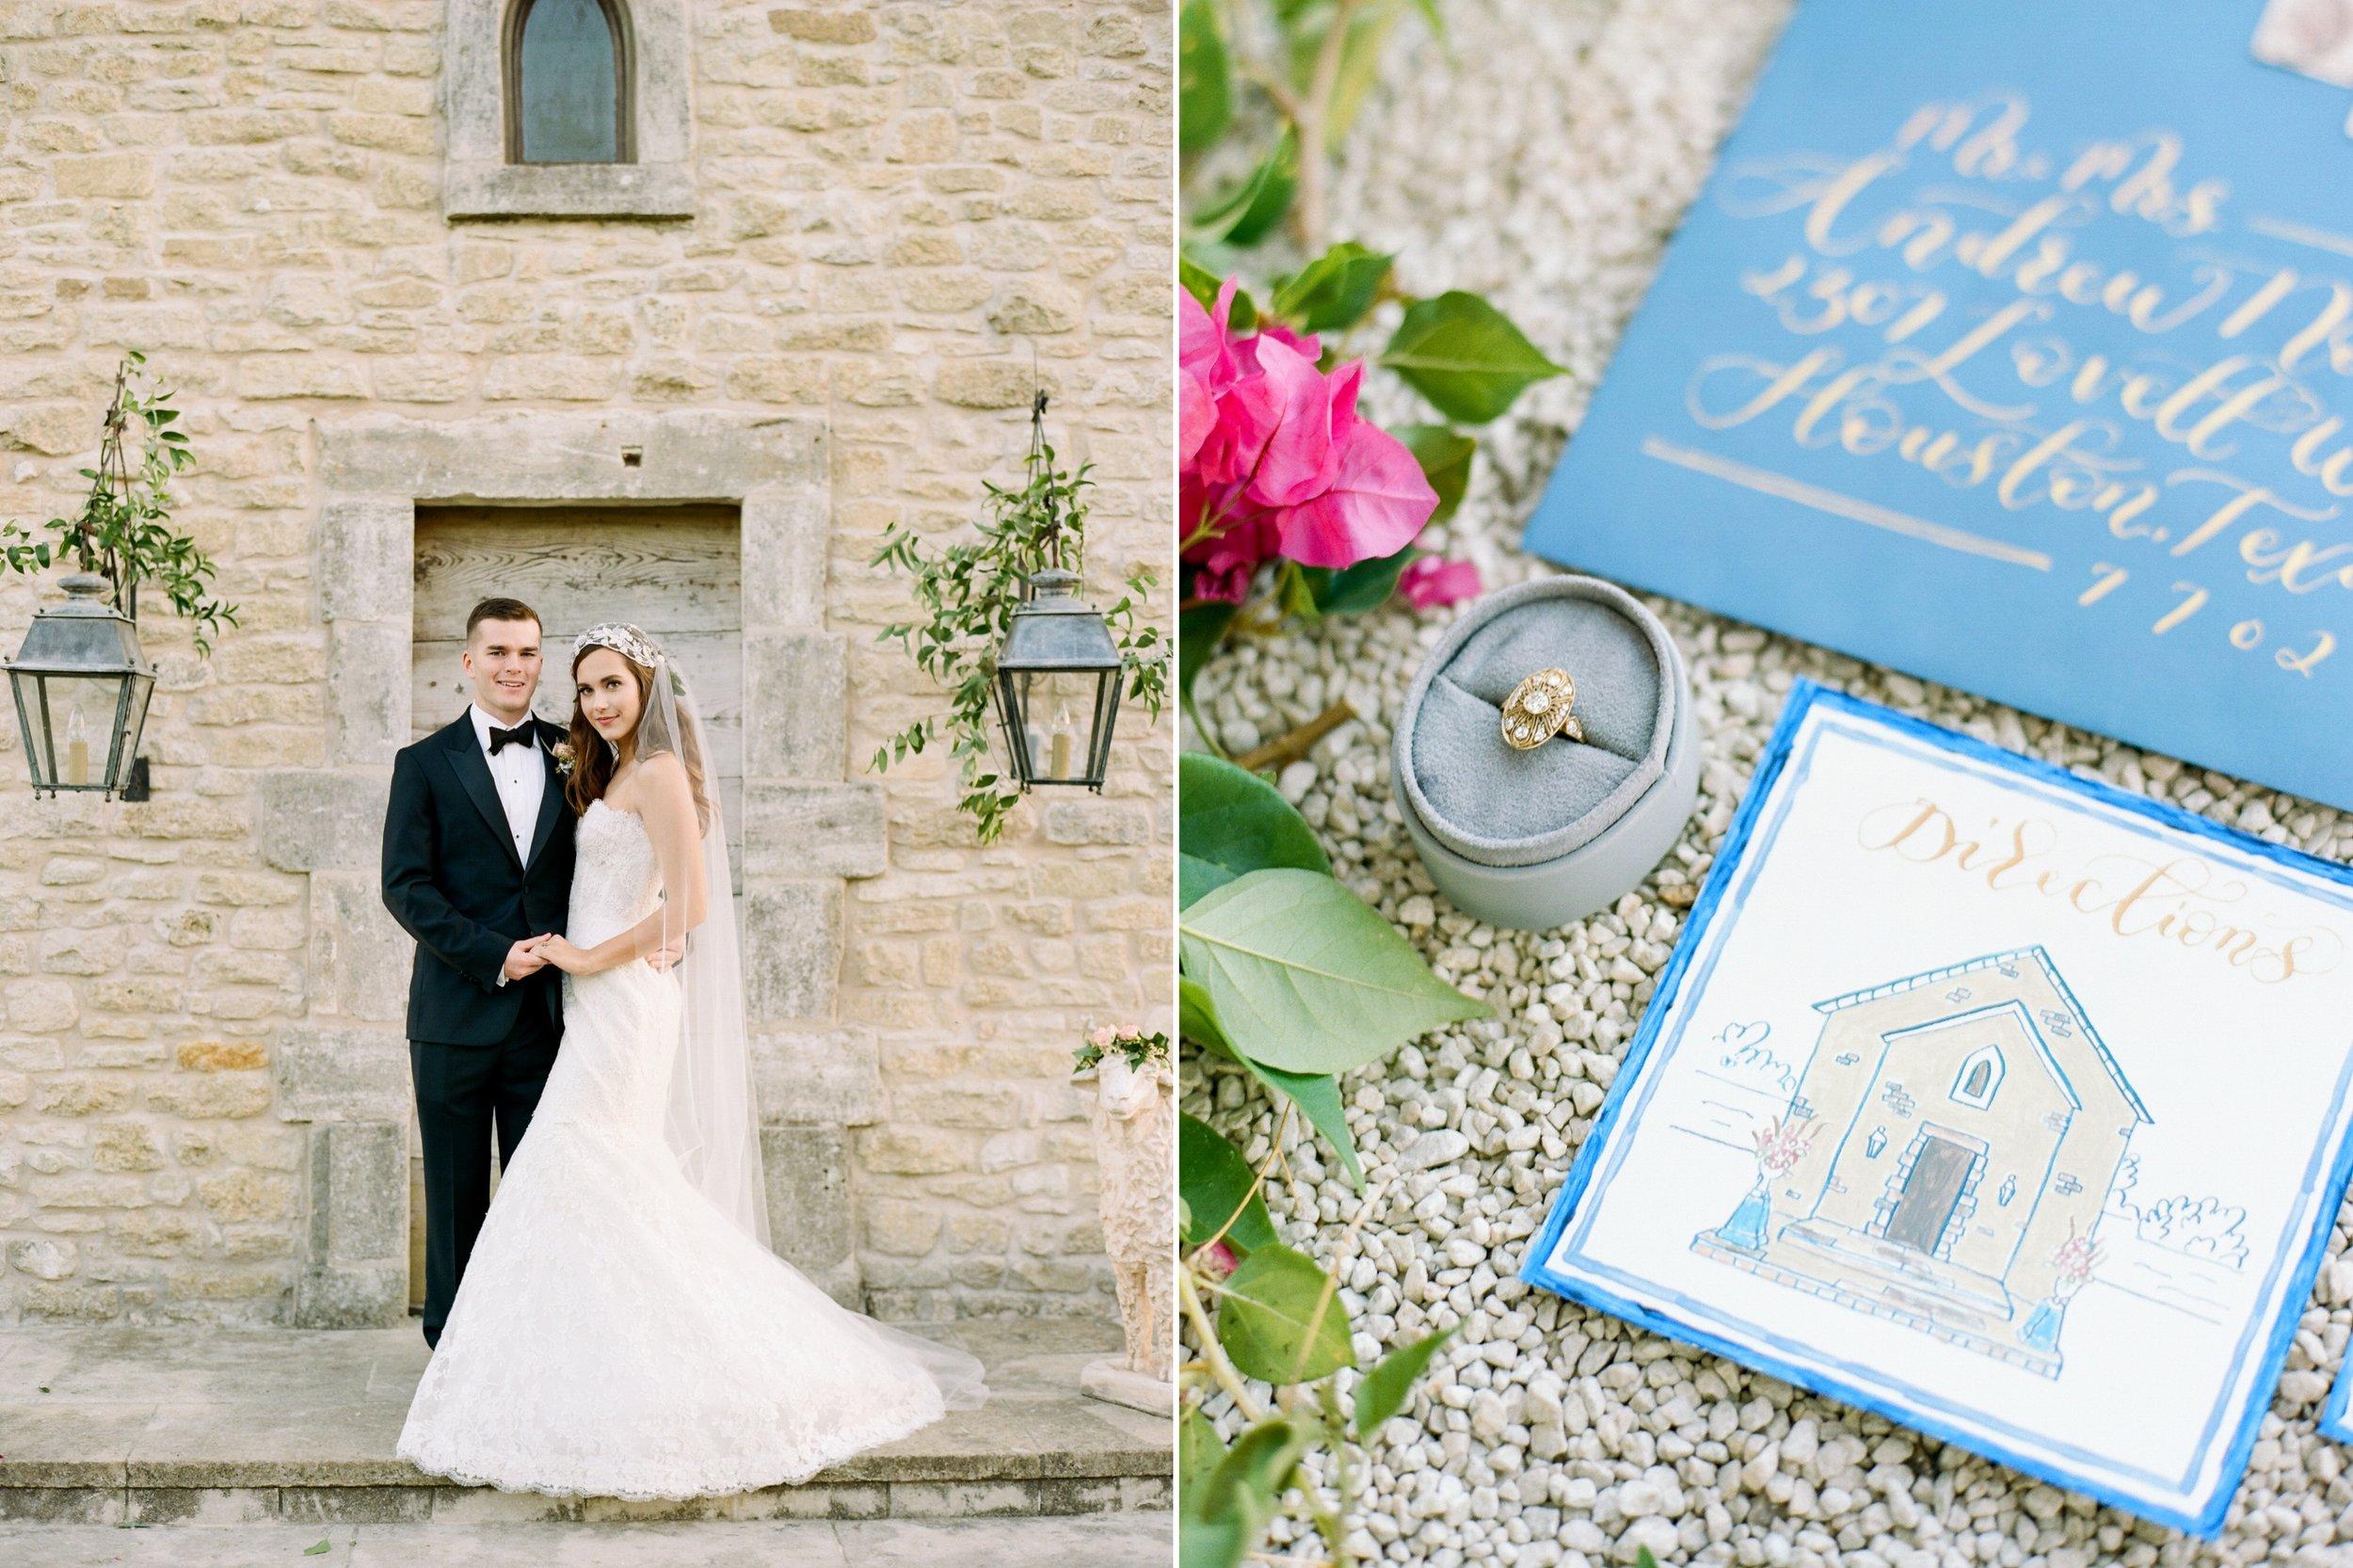 the-clubs-at-houston-oaks-wedding-houston-oaks-wedding-ceremony-houston-oaks-chapel-belle-of-the-ball-dana-fernandez-photography-houston-wedding-photographer-luxury-film-fine-art-114.jpg